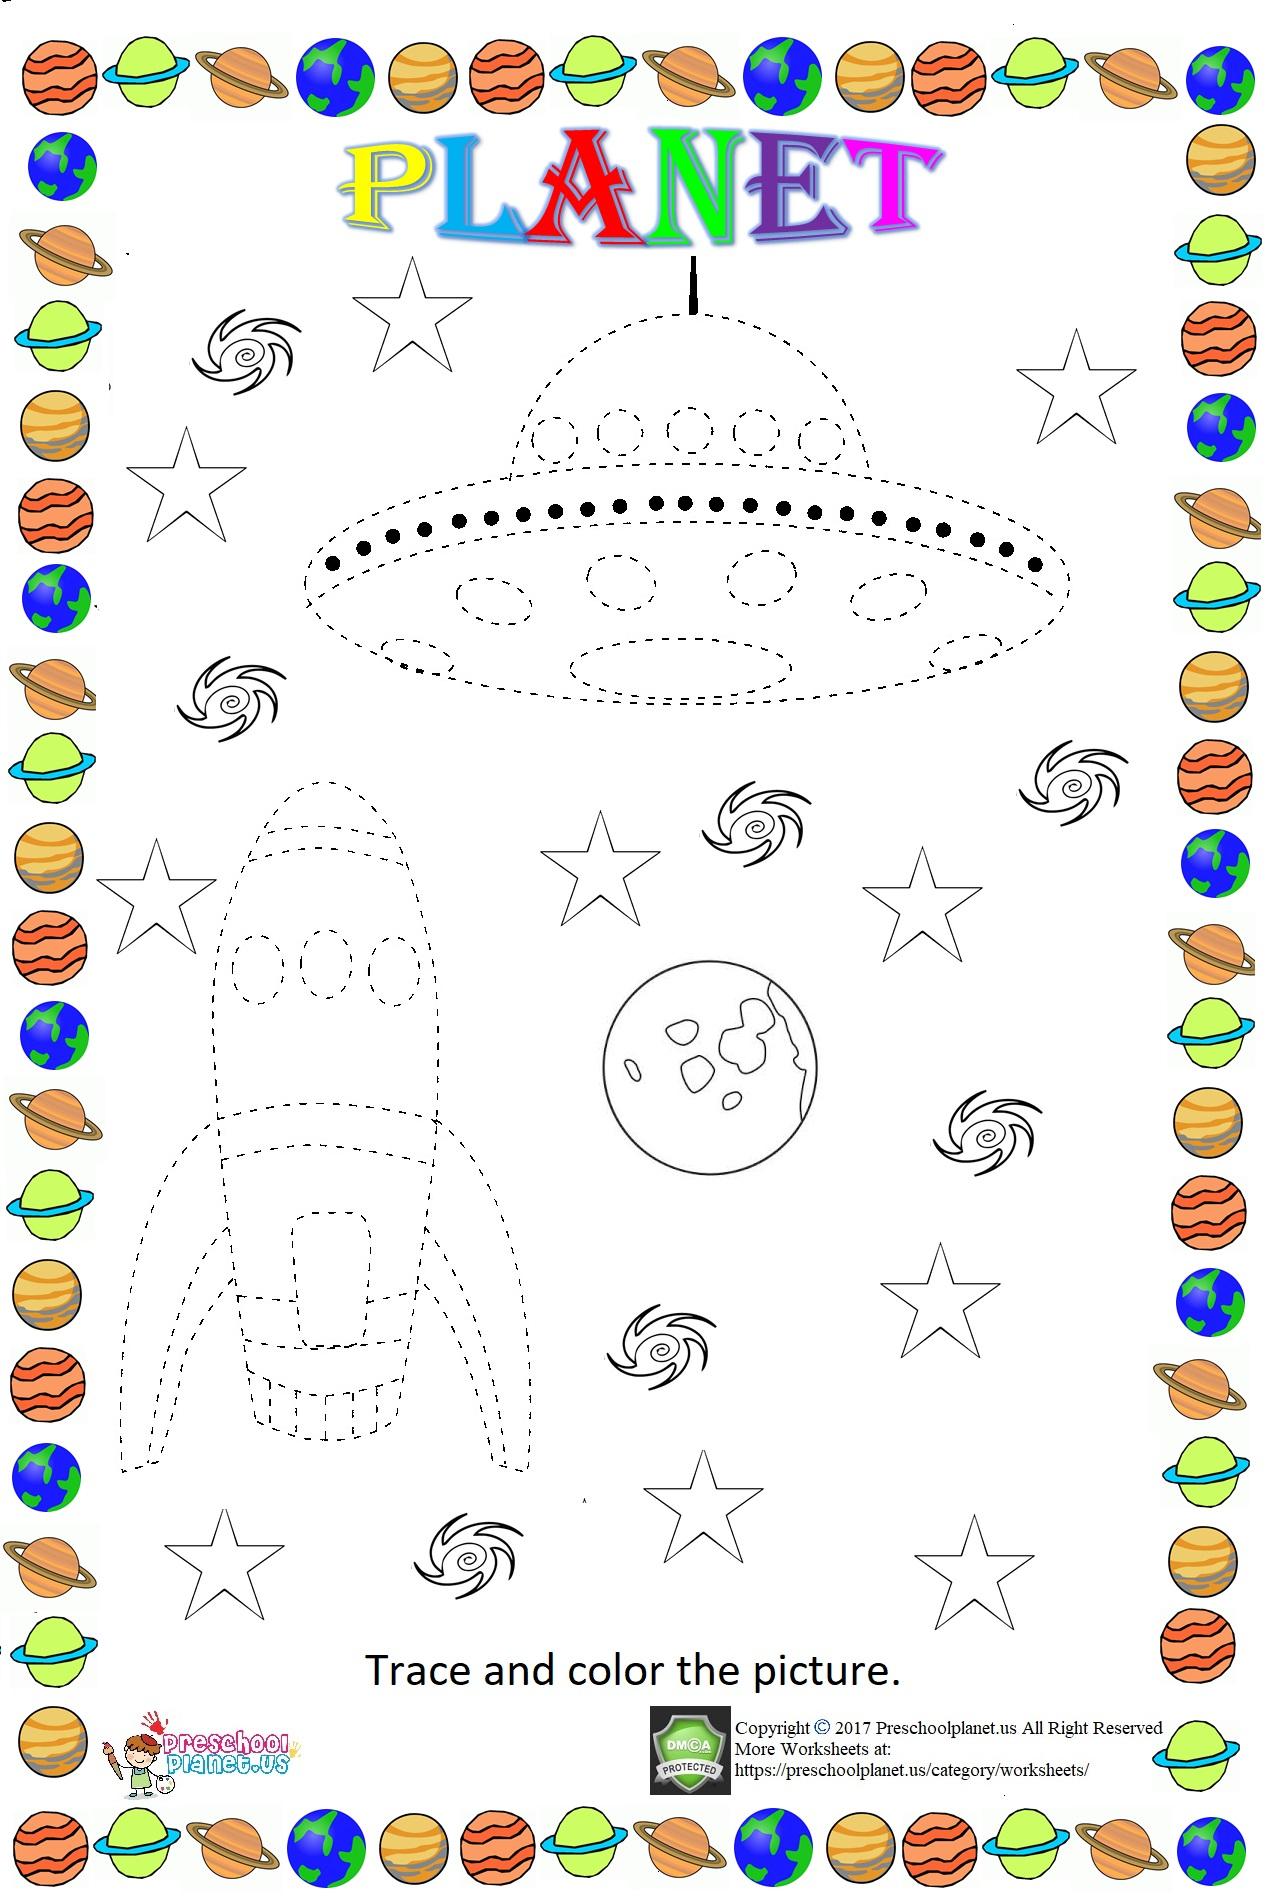 Space Themed Trace Worksheet – Preschoolplanet